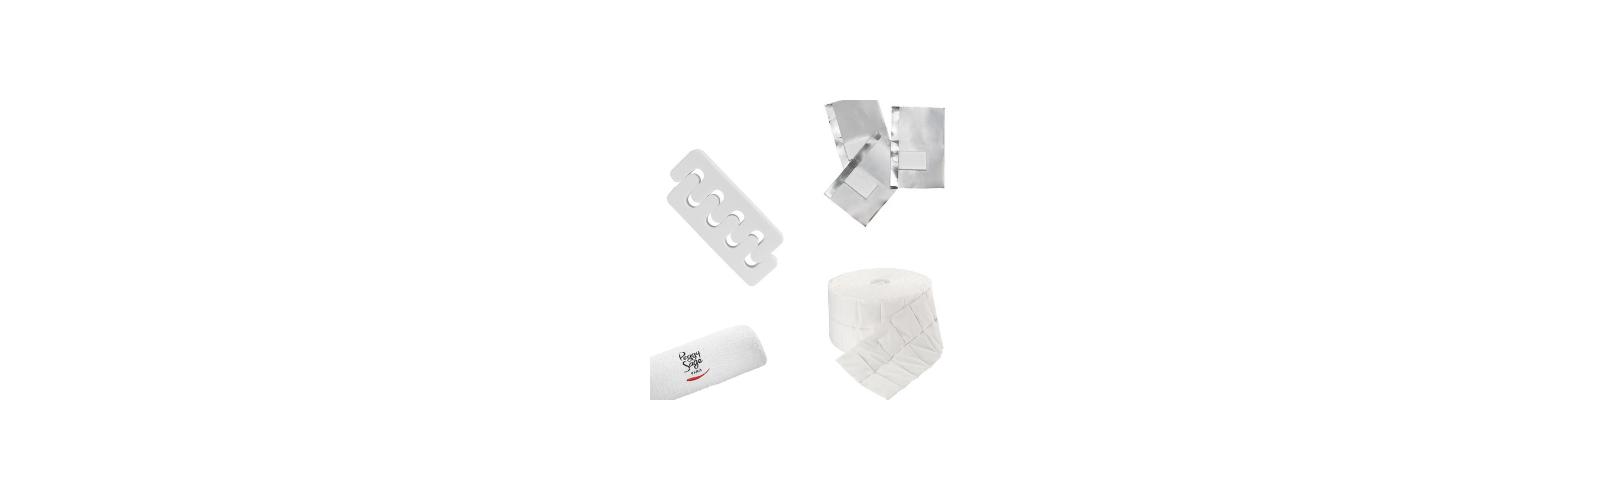 Accessoris manicura i pedicura